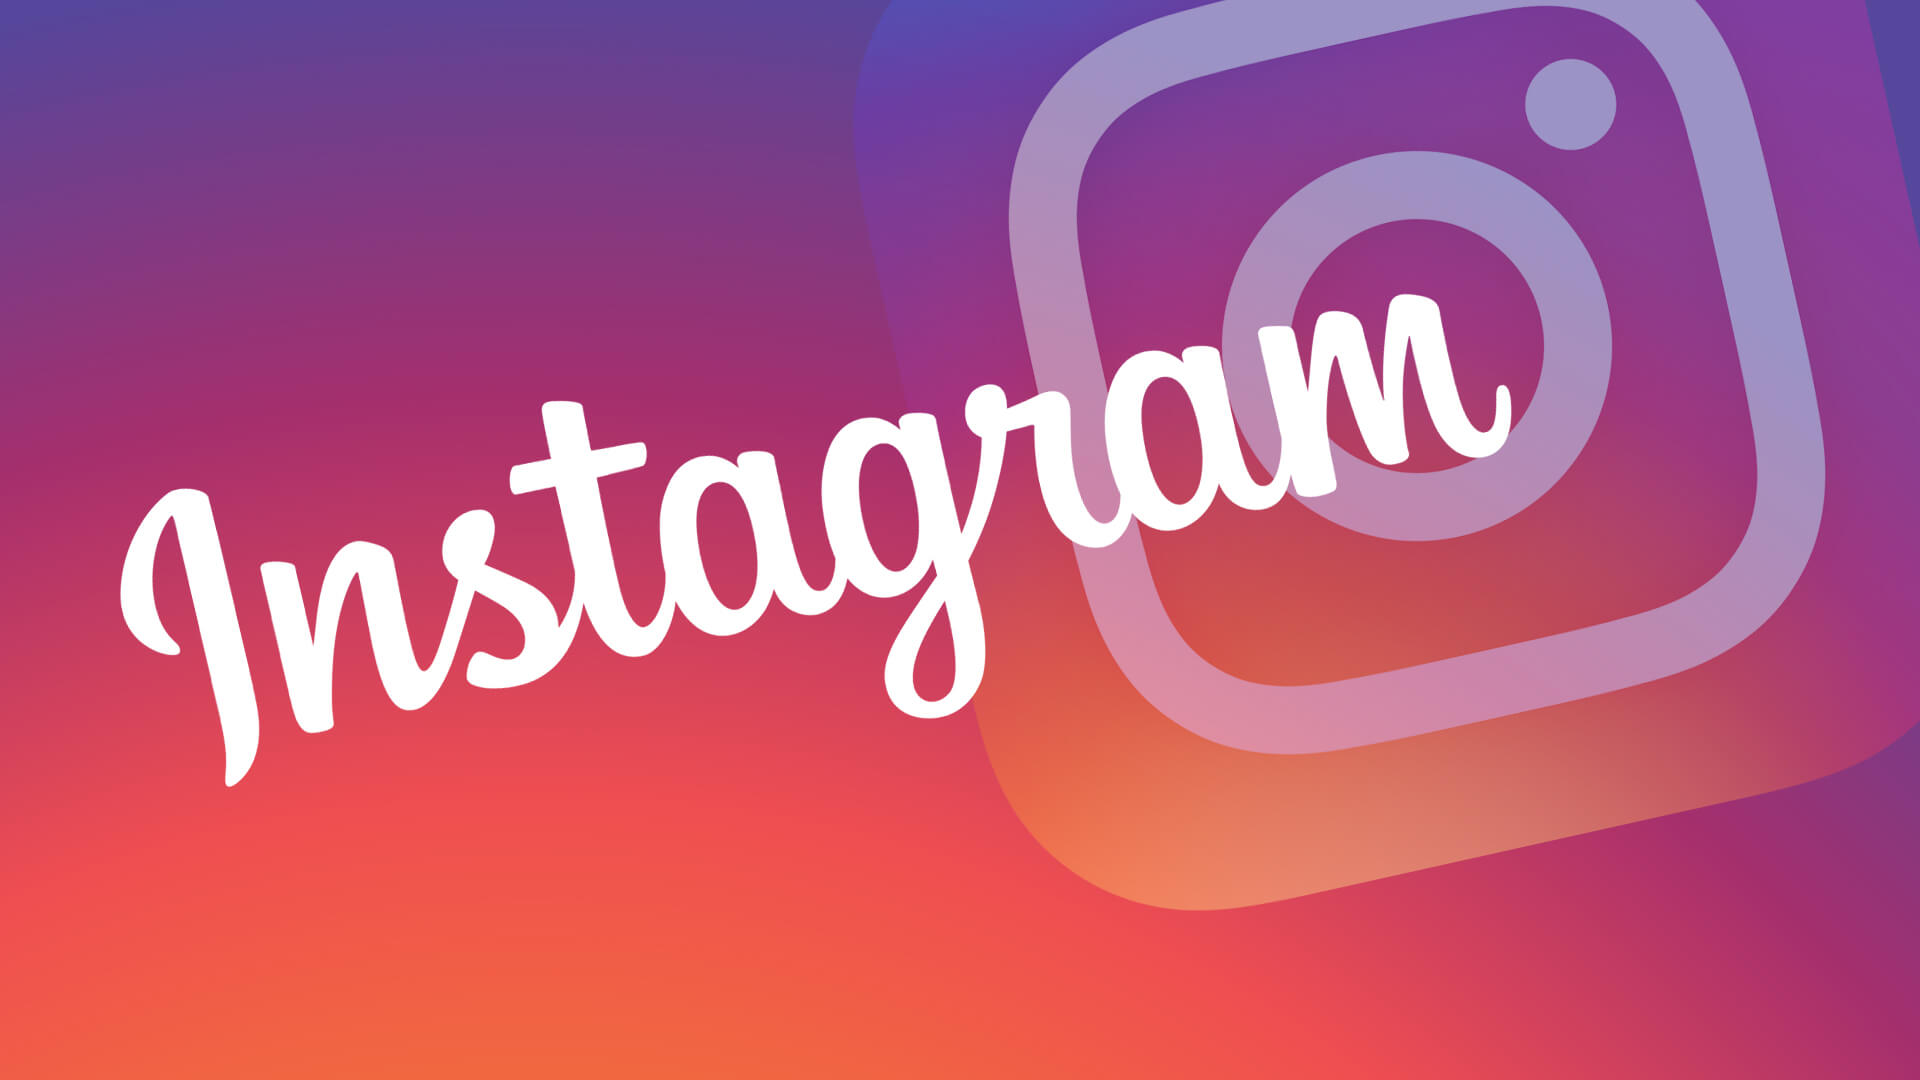 comment avoir legende instagram attirante